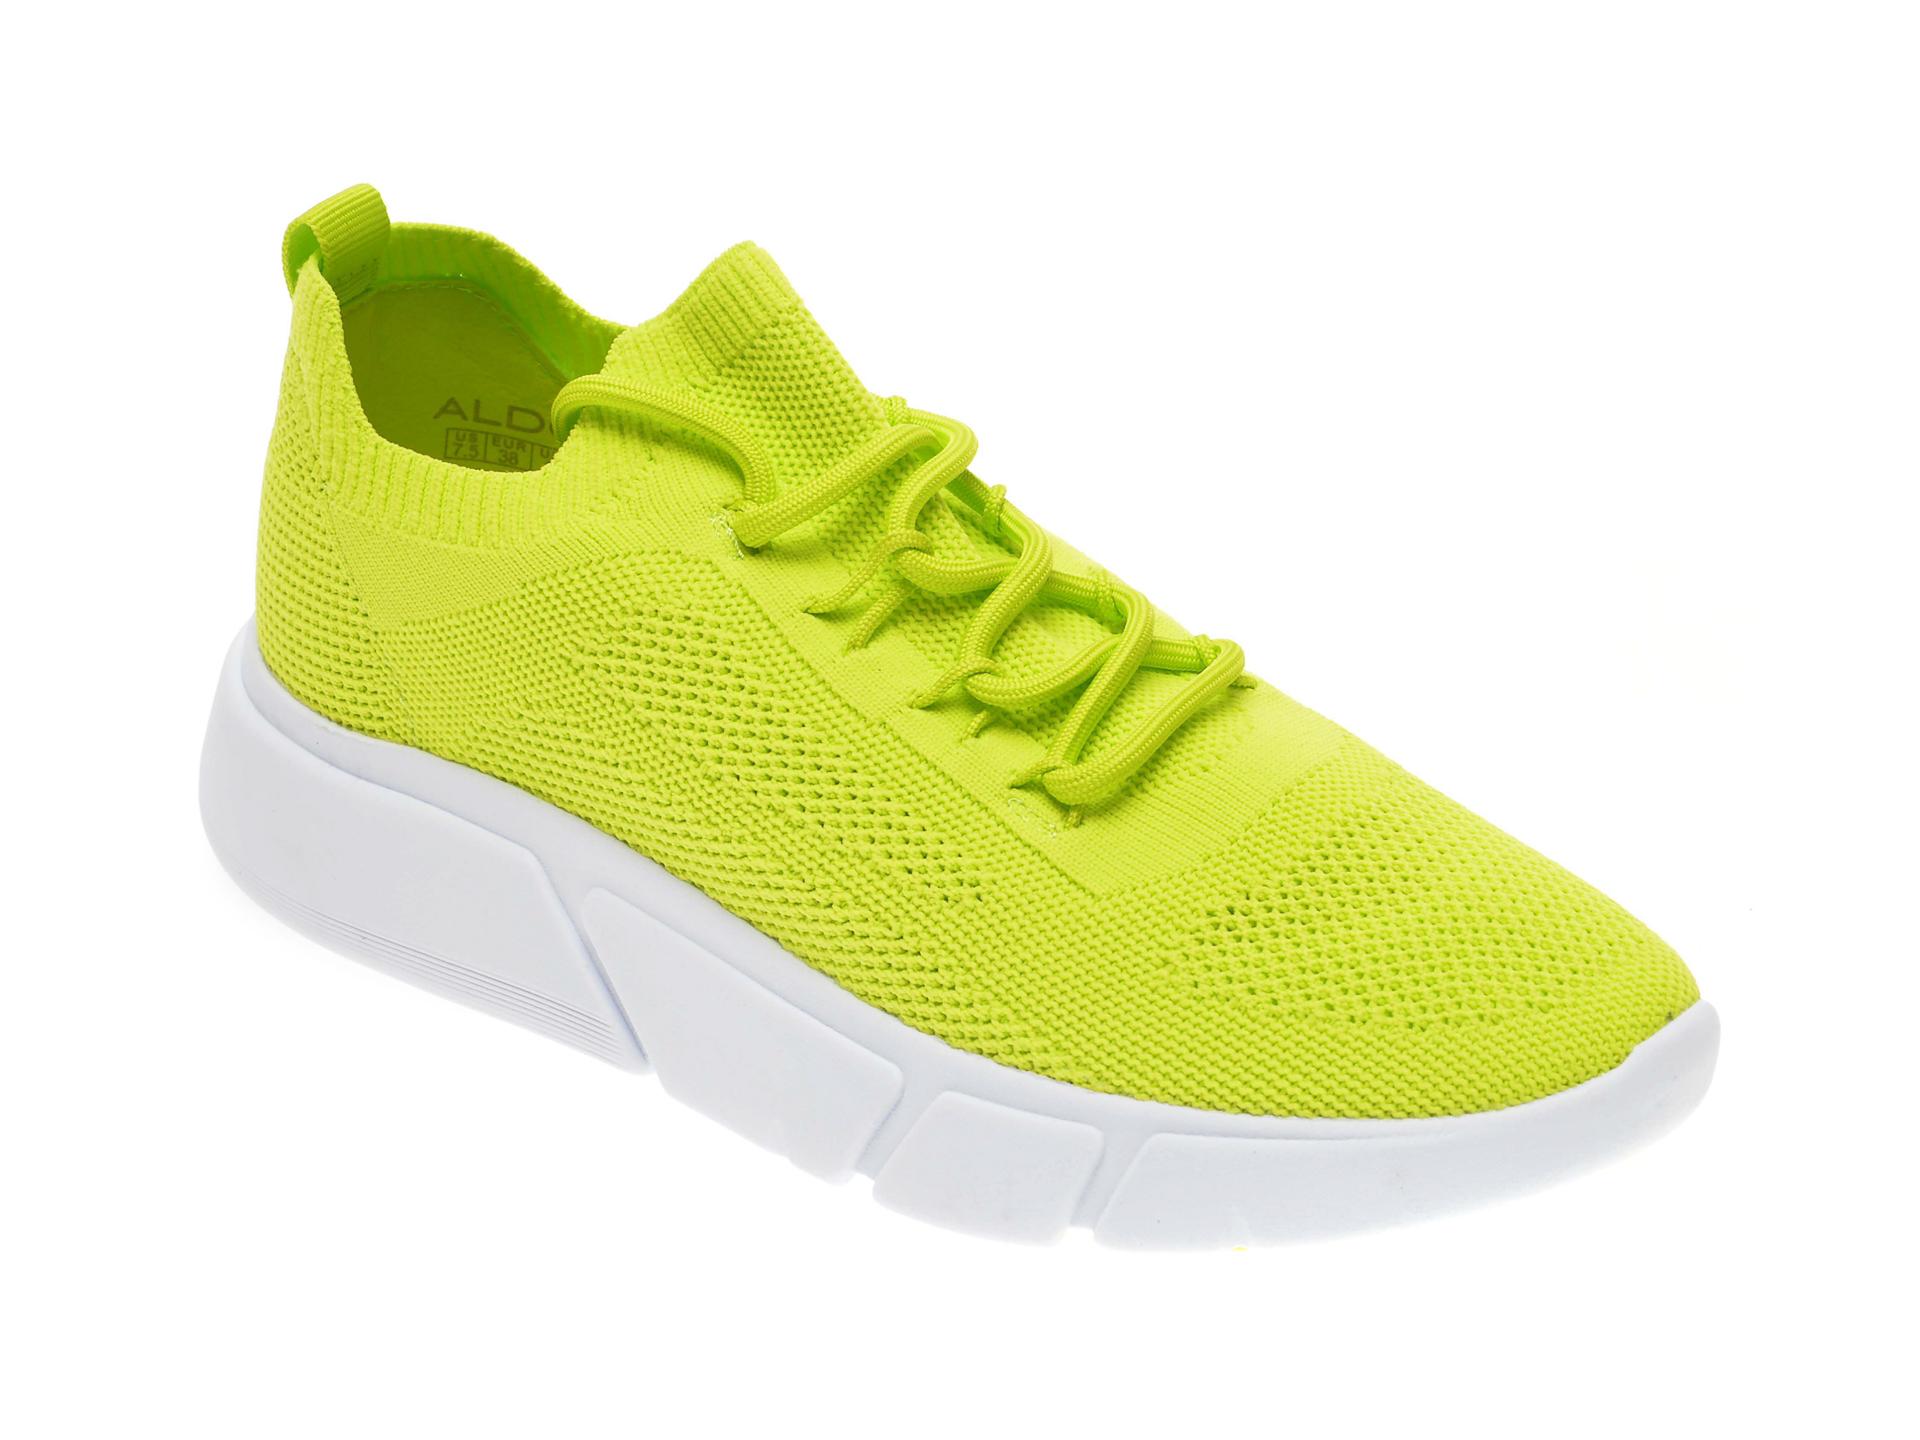 Pantofi sport ALDO verzi, Ambla320, din material textil imagine